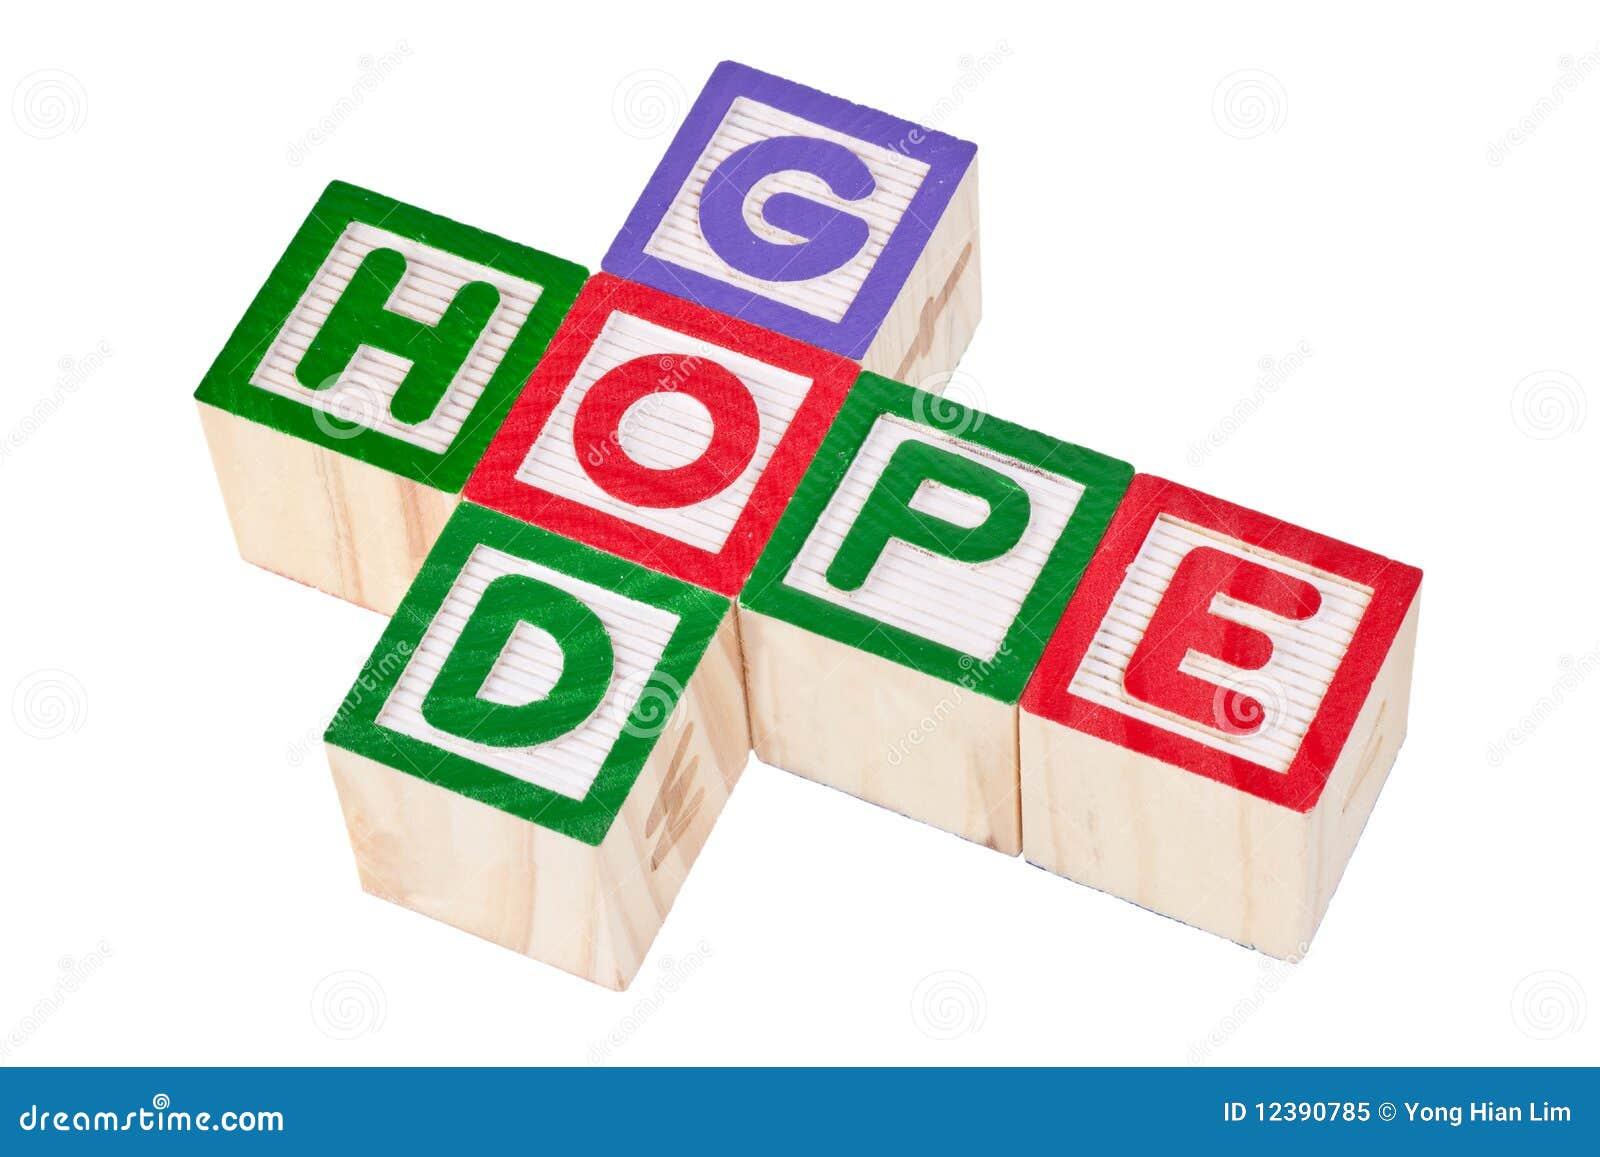 Dieu et espoir